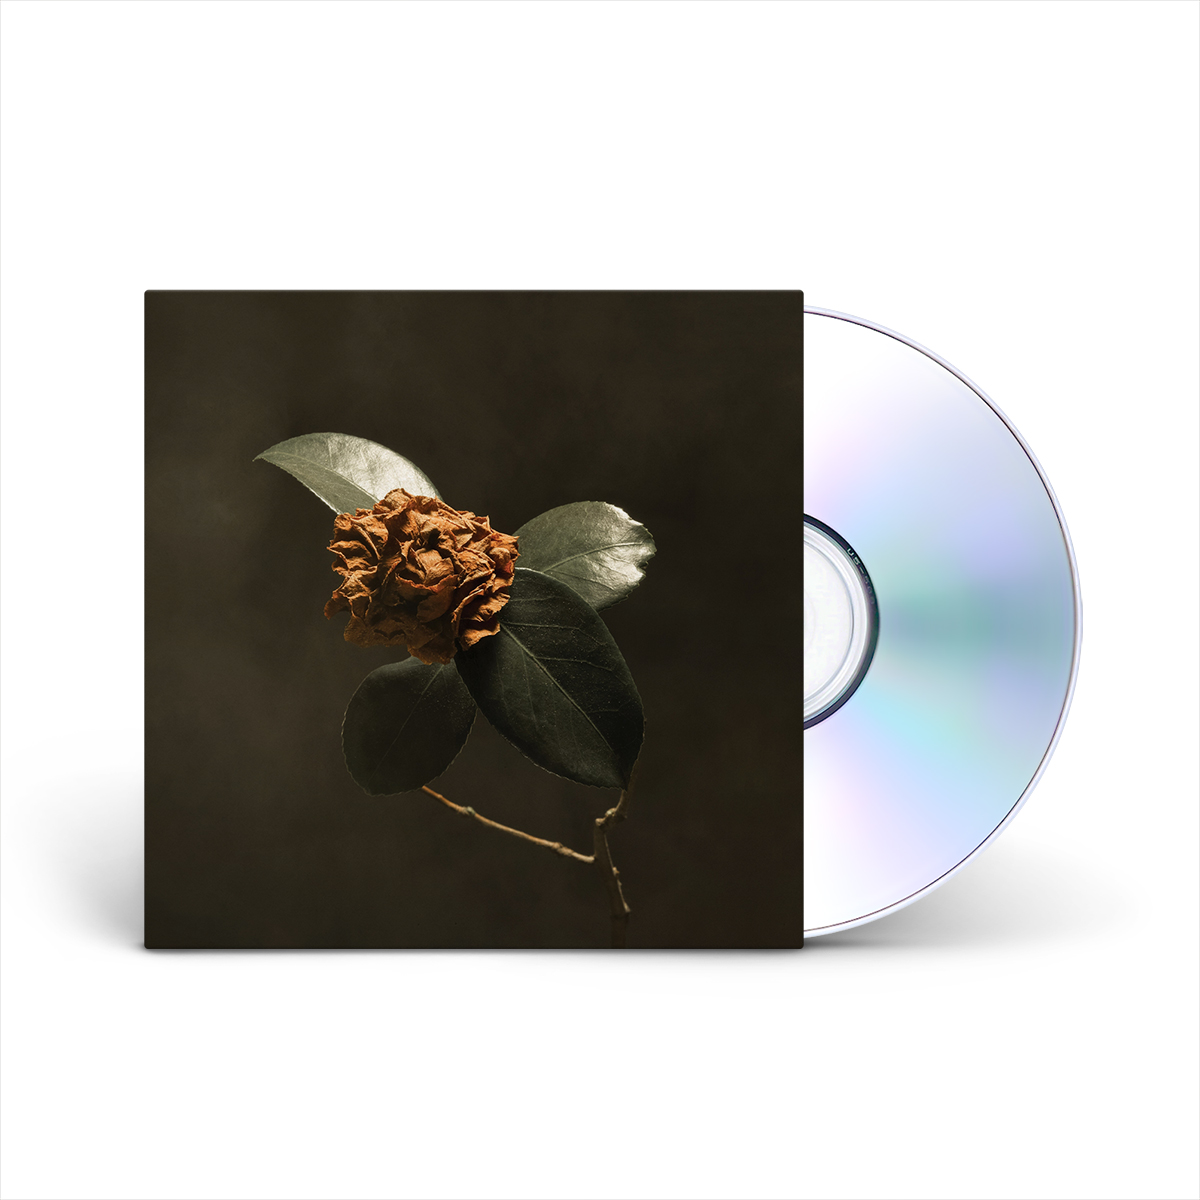 St. Paul & The Broken Bones - Young Sick Camellia CD